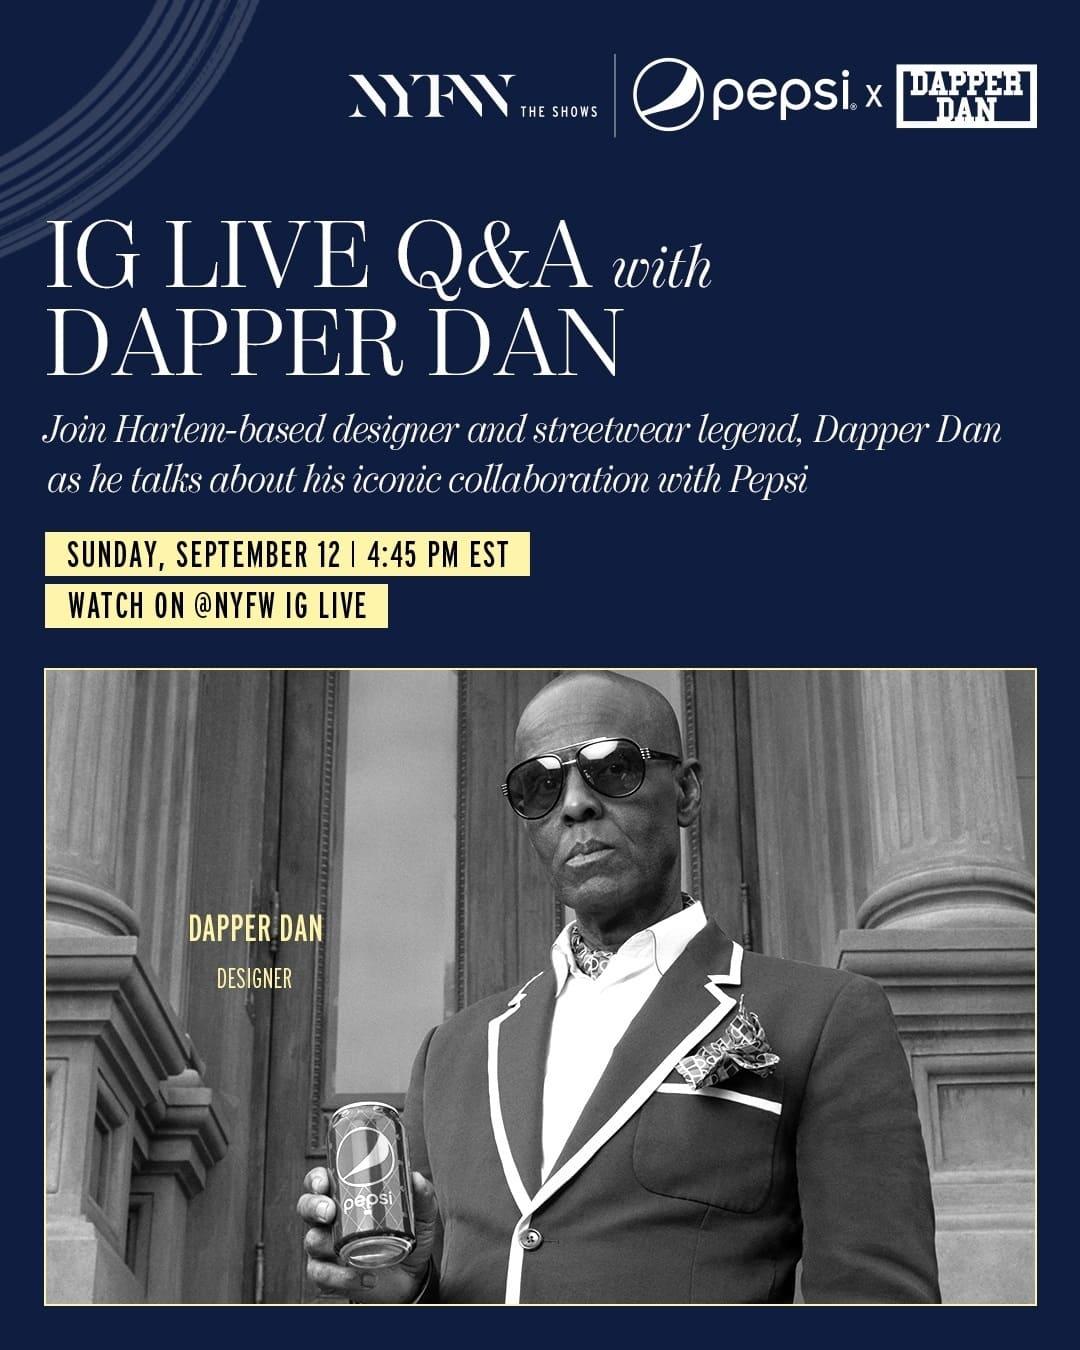 Dapper Dan x Pepsi official sponsors of New York Fashion Week